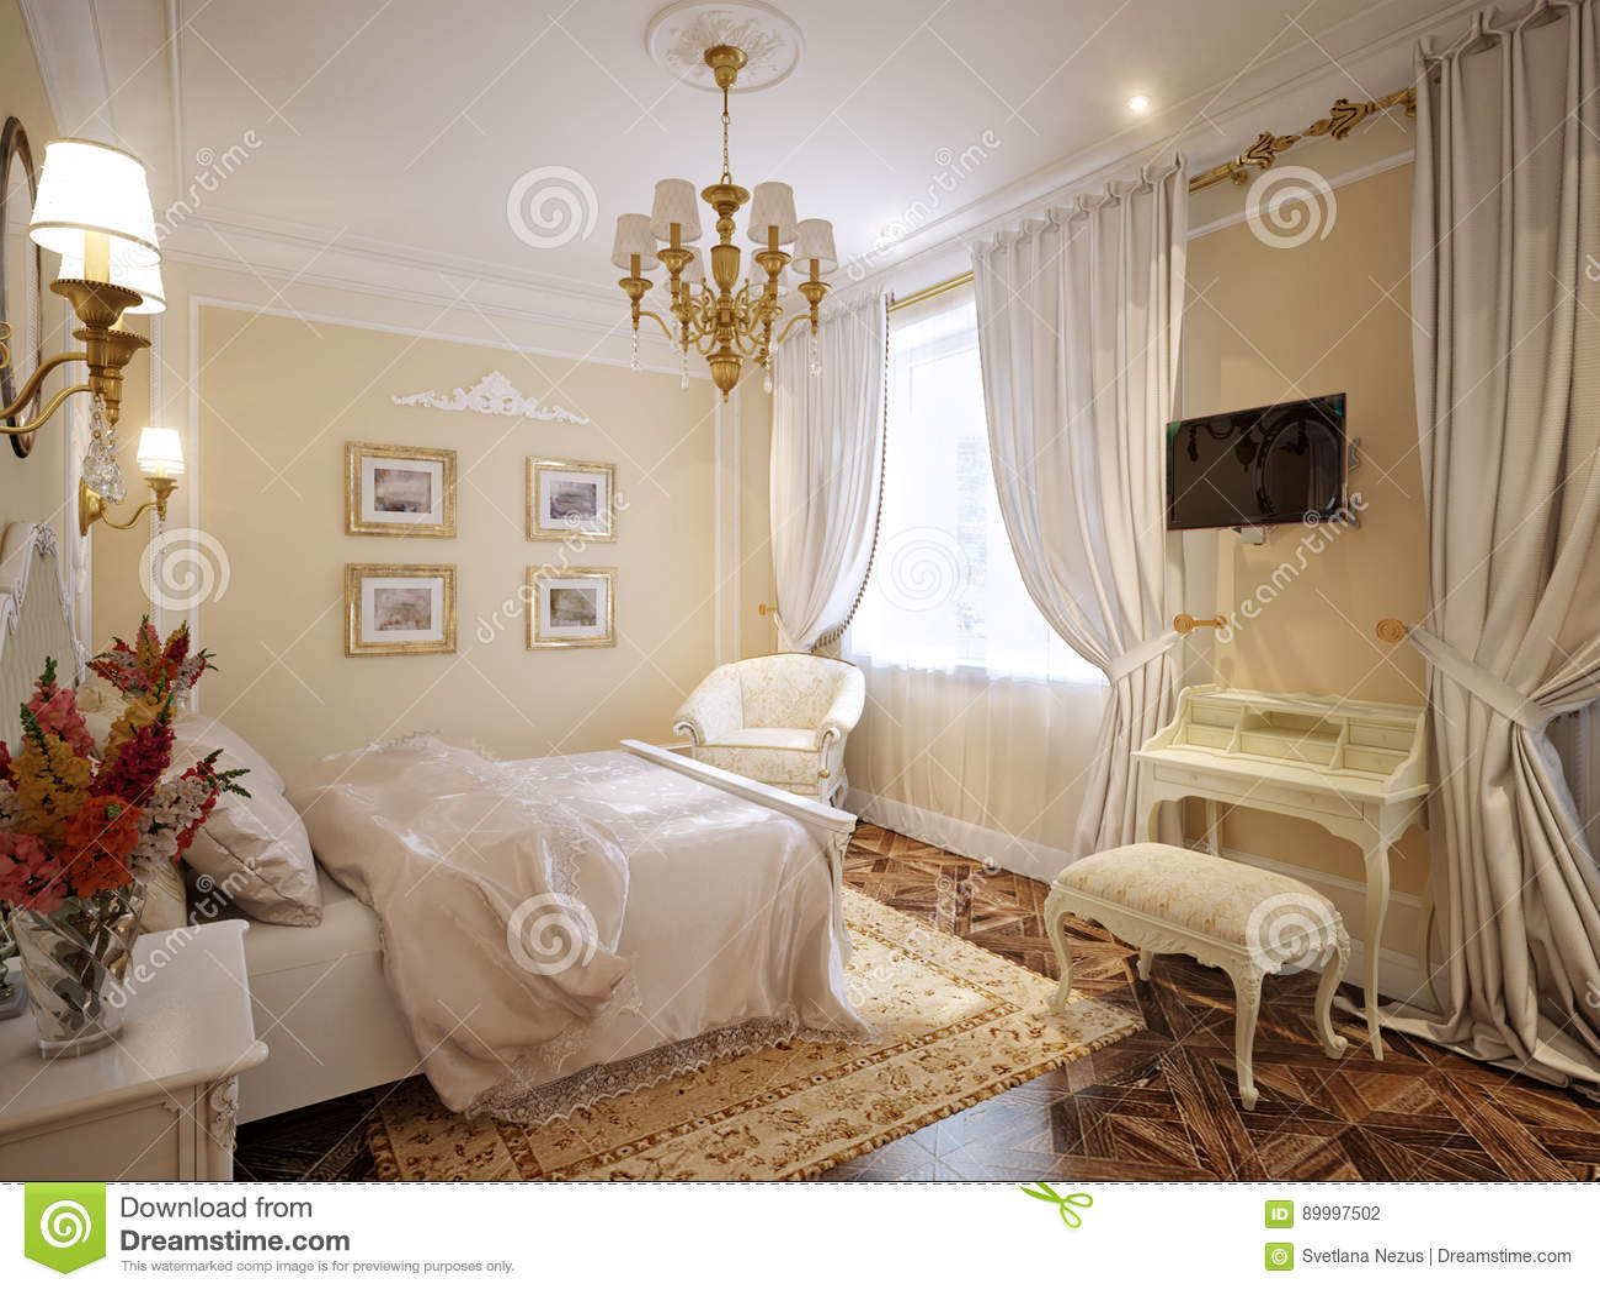 Luxury Classic Interior Design Bedroom Luxury Classic Modern Bedroom Interior Design